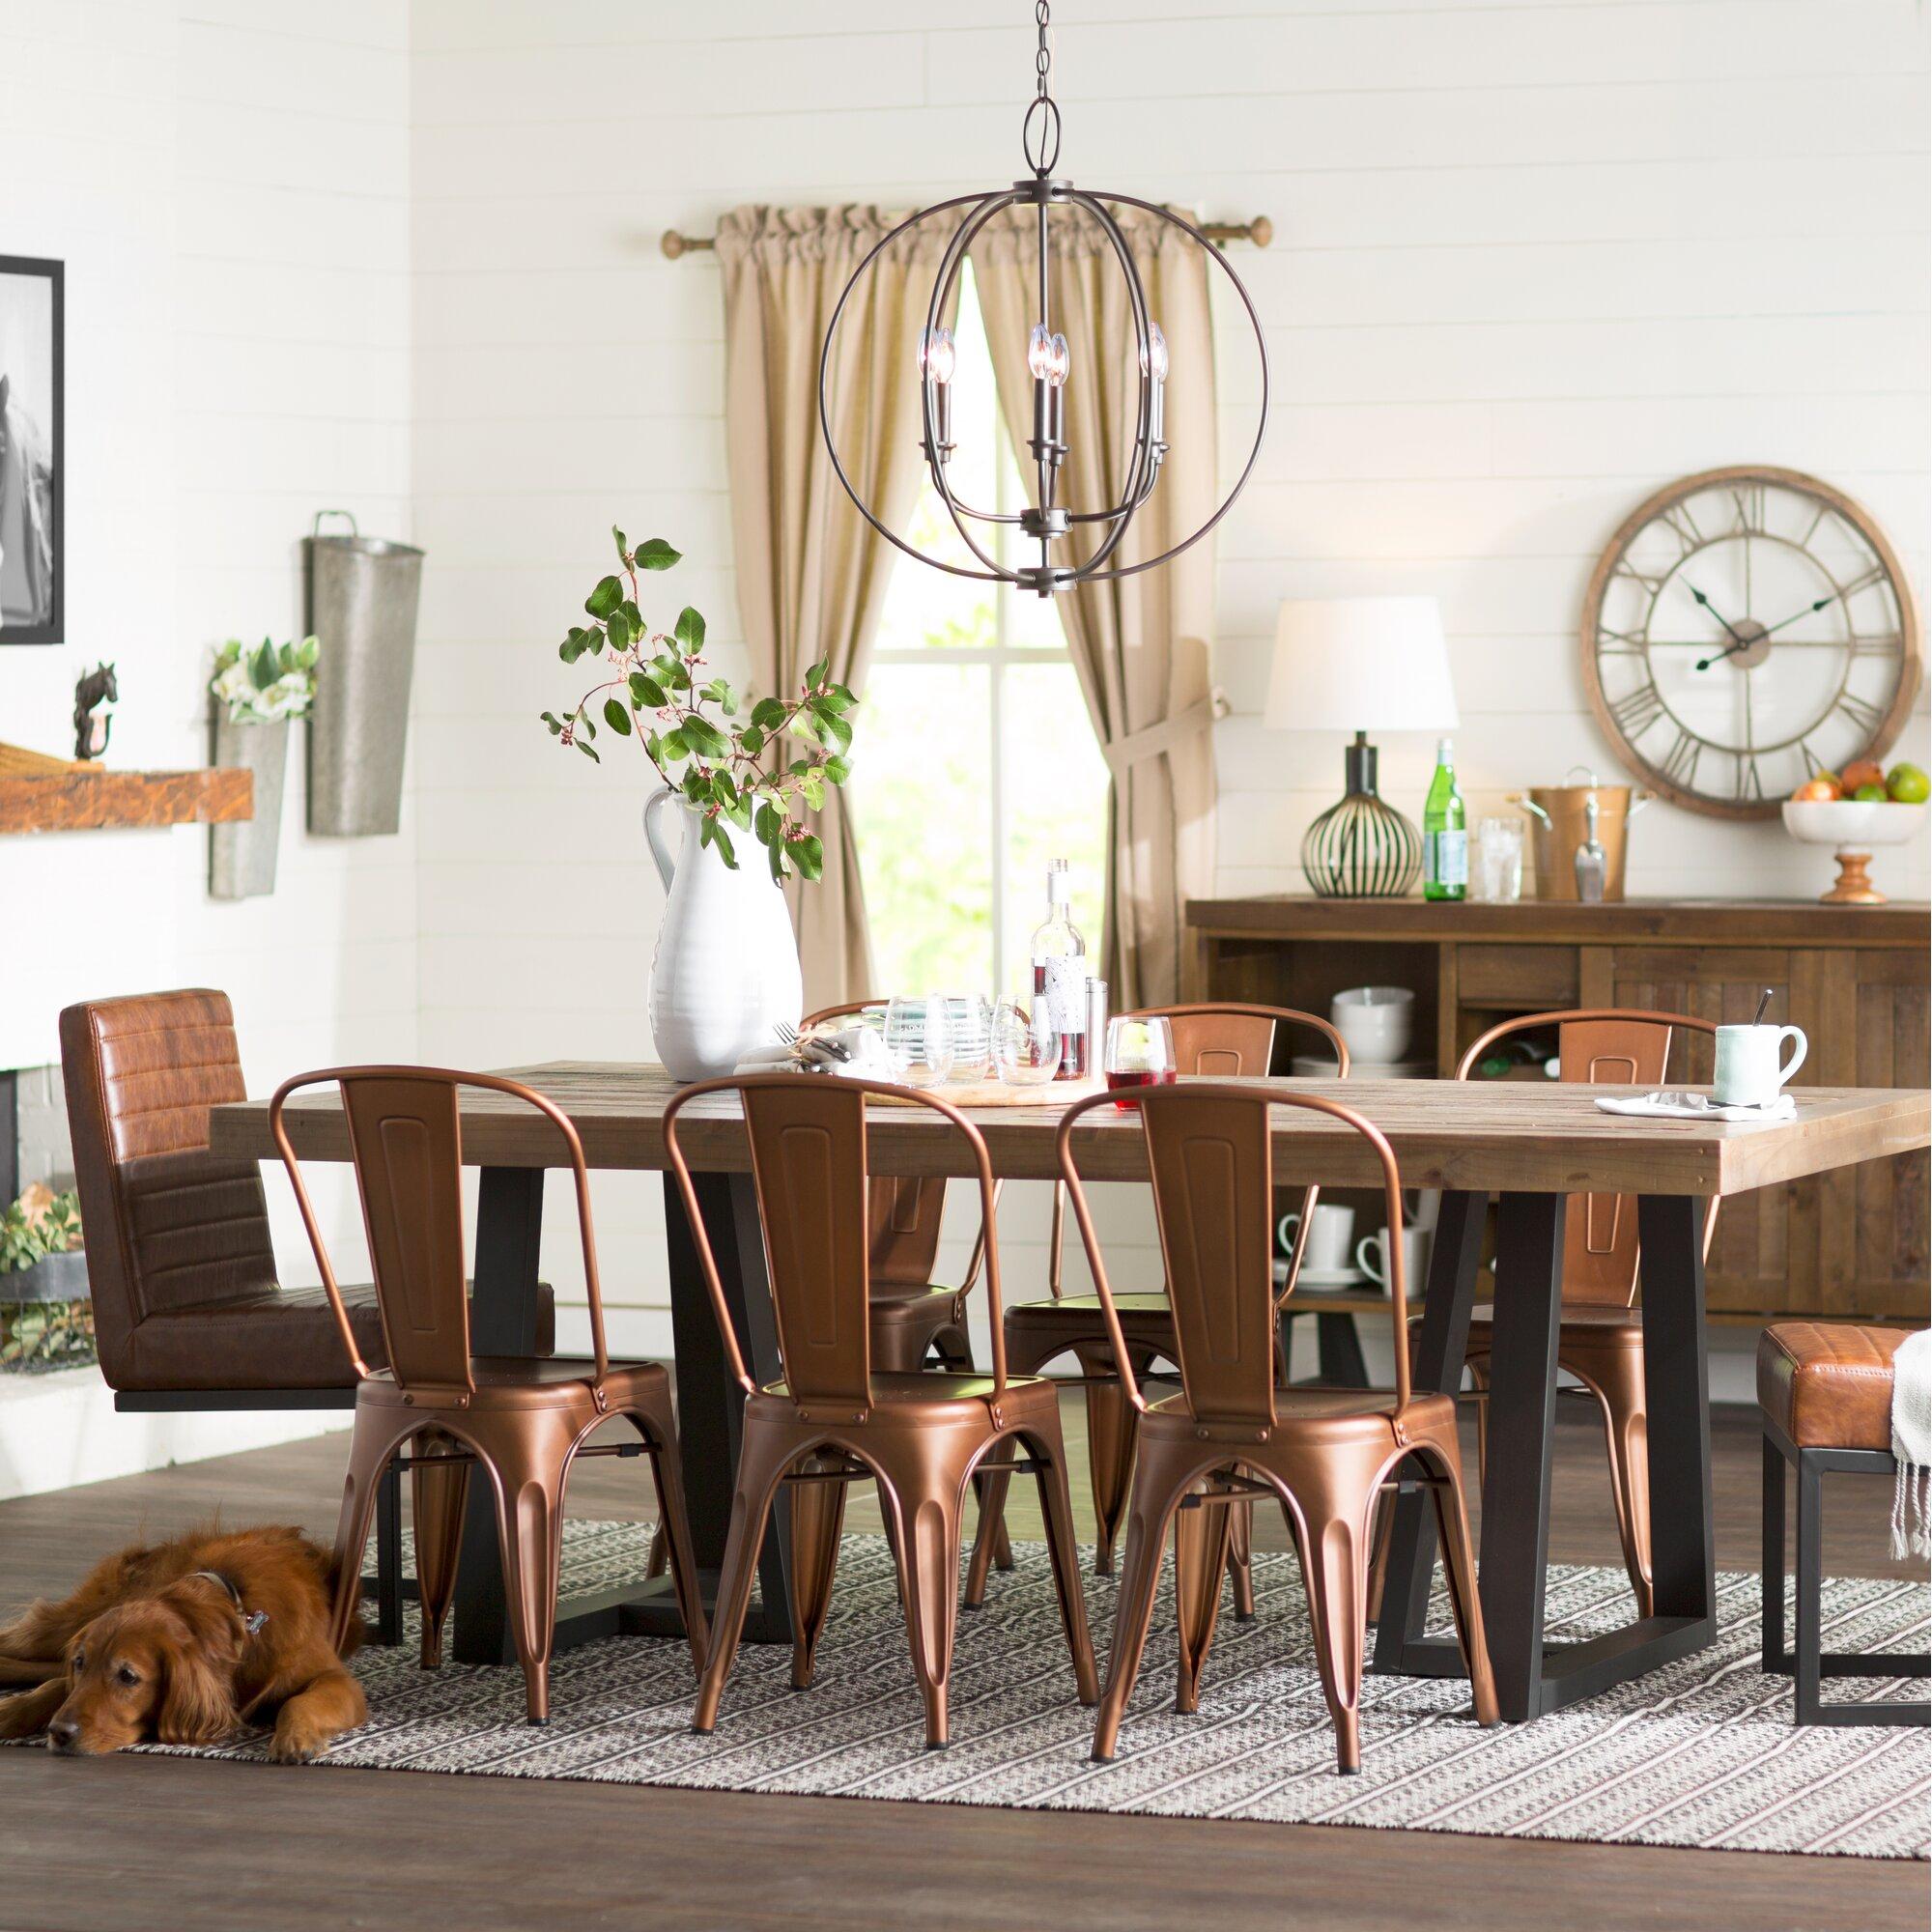 Laurel foundry modern farmhouse adell dining table - Laurel foundry modern farmhouse bedroom ...